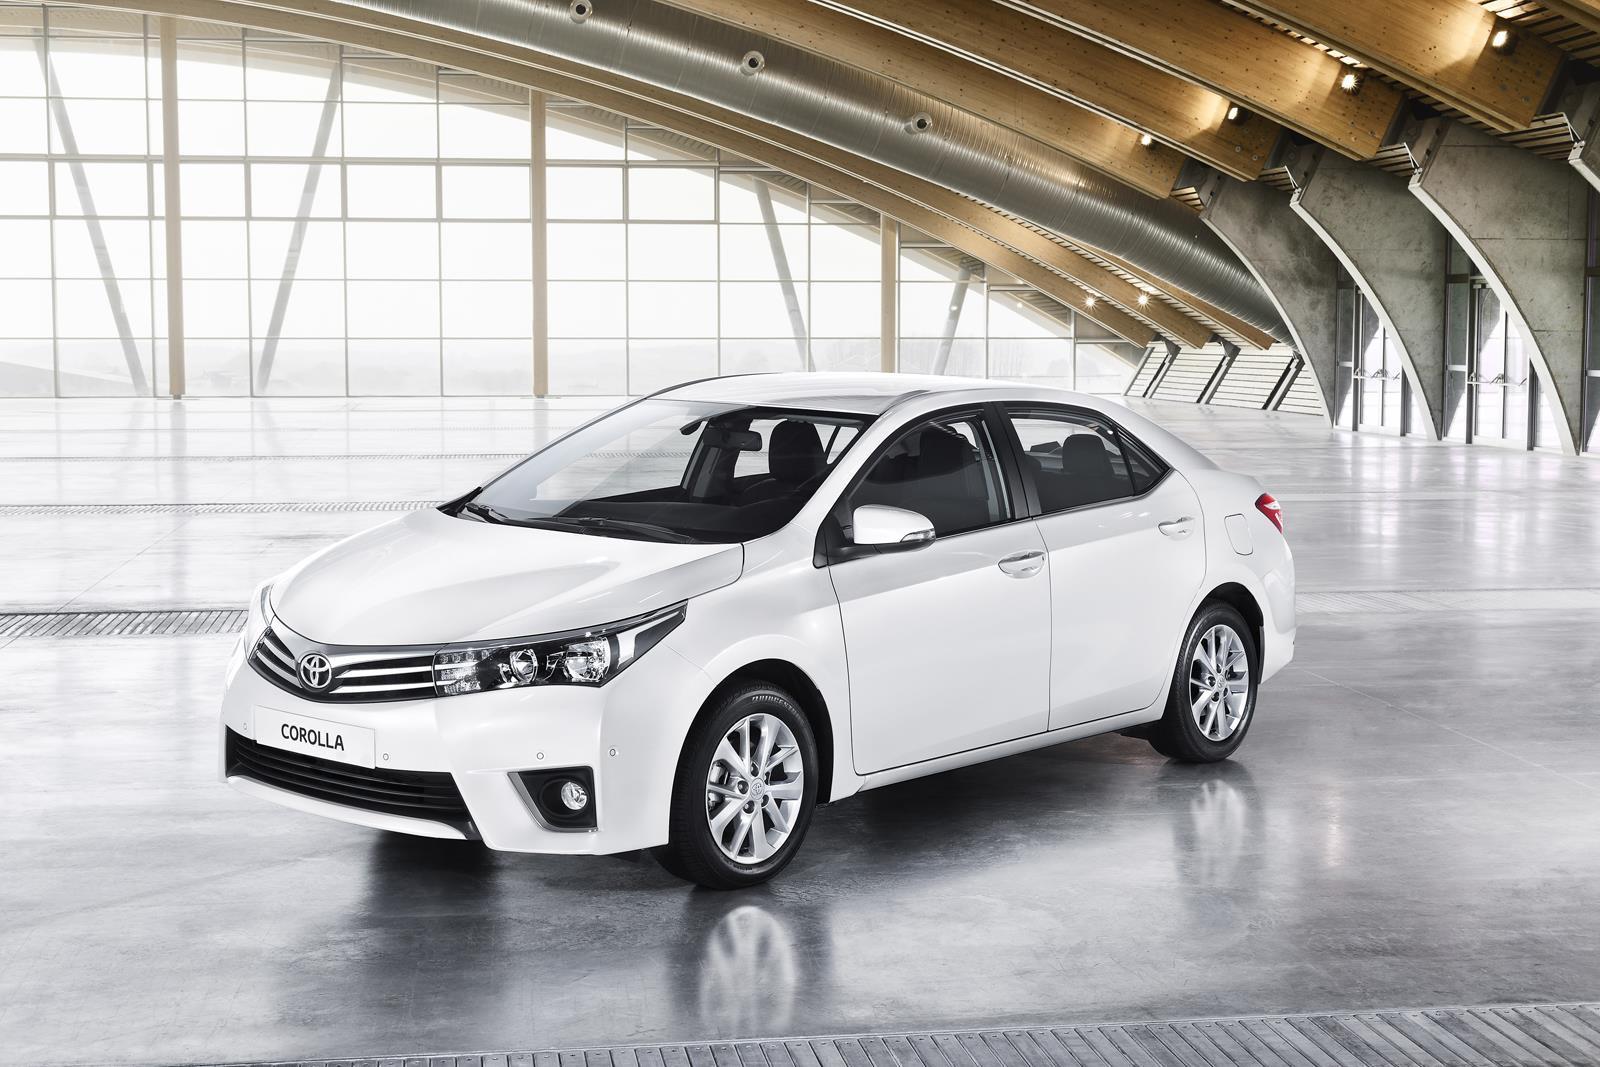 Toyota Corolla new